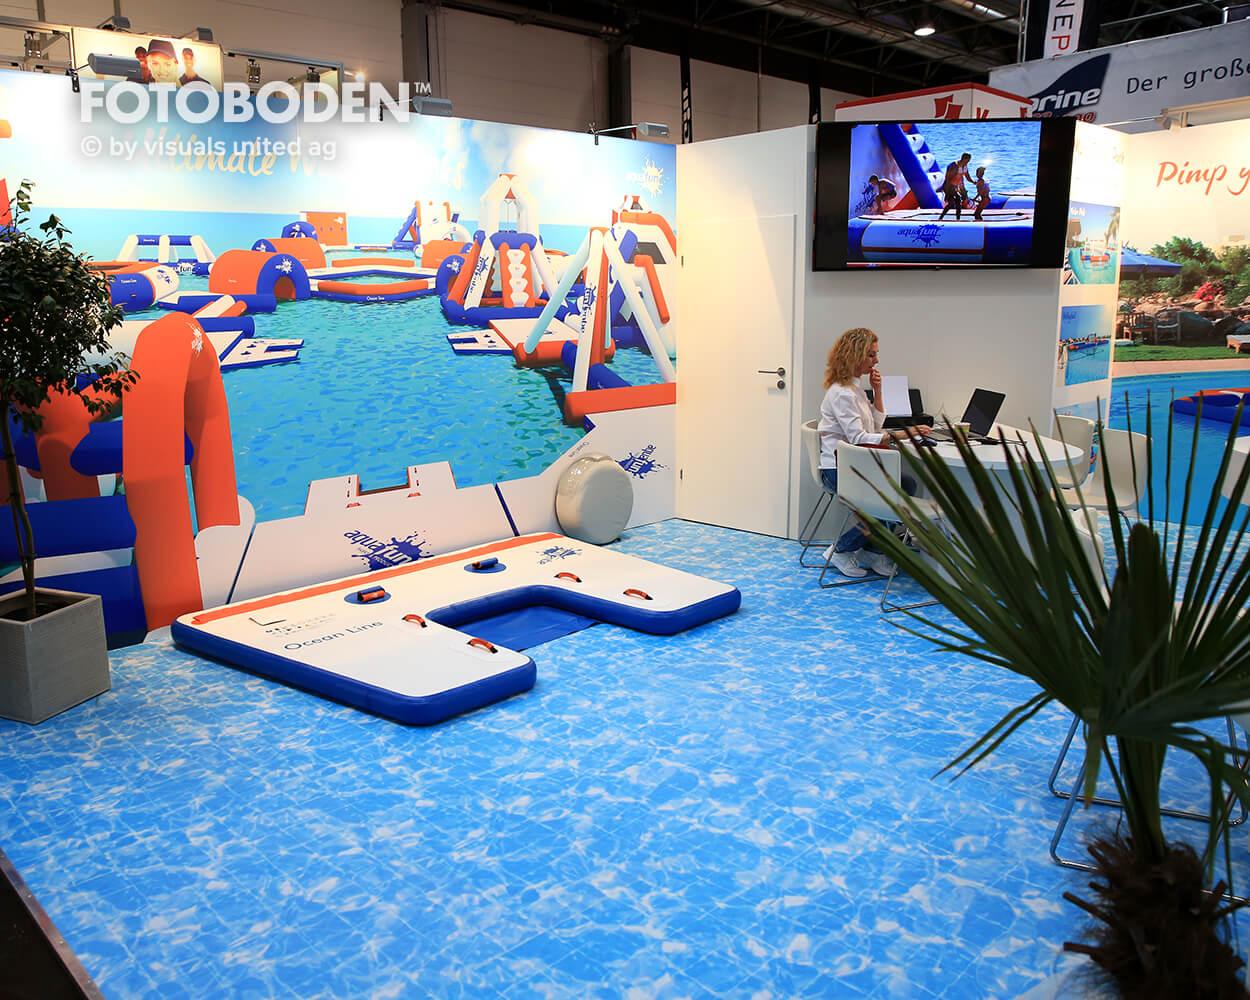 Boot2018 Fotoboden Messeboden Tradeshow Flooring Bodengestaltung Messe Bodendesign Messedesign Design Boden Messegestaltung 8